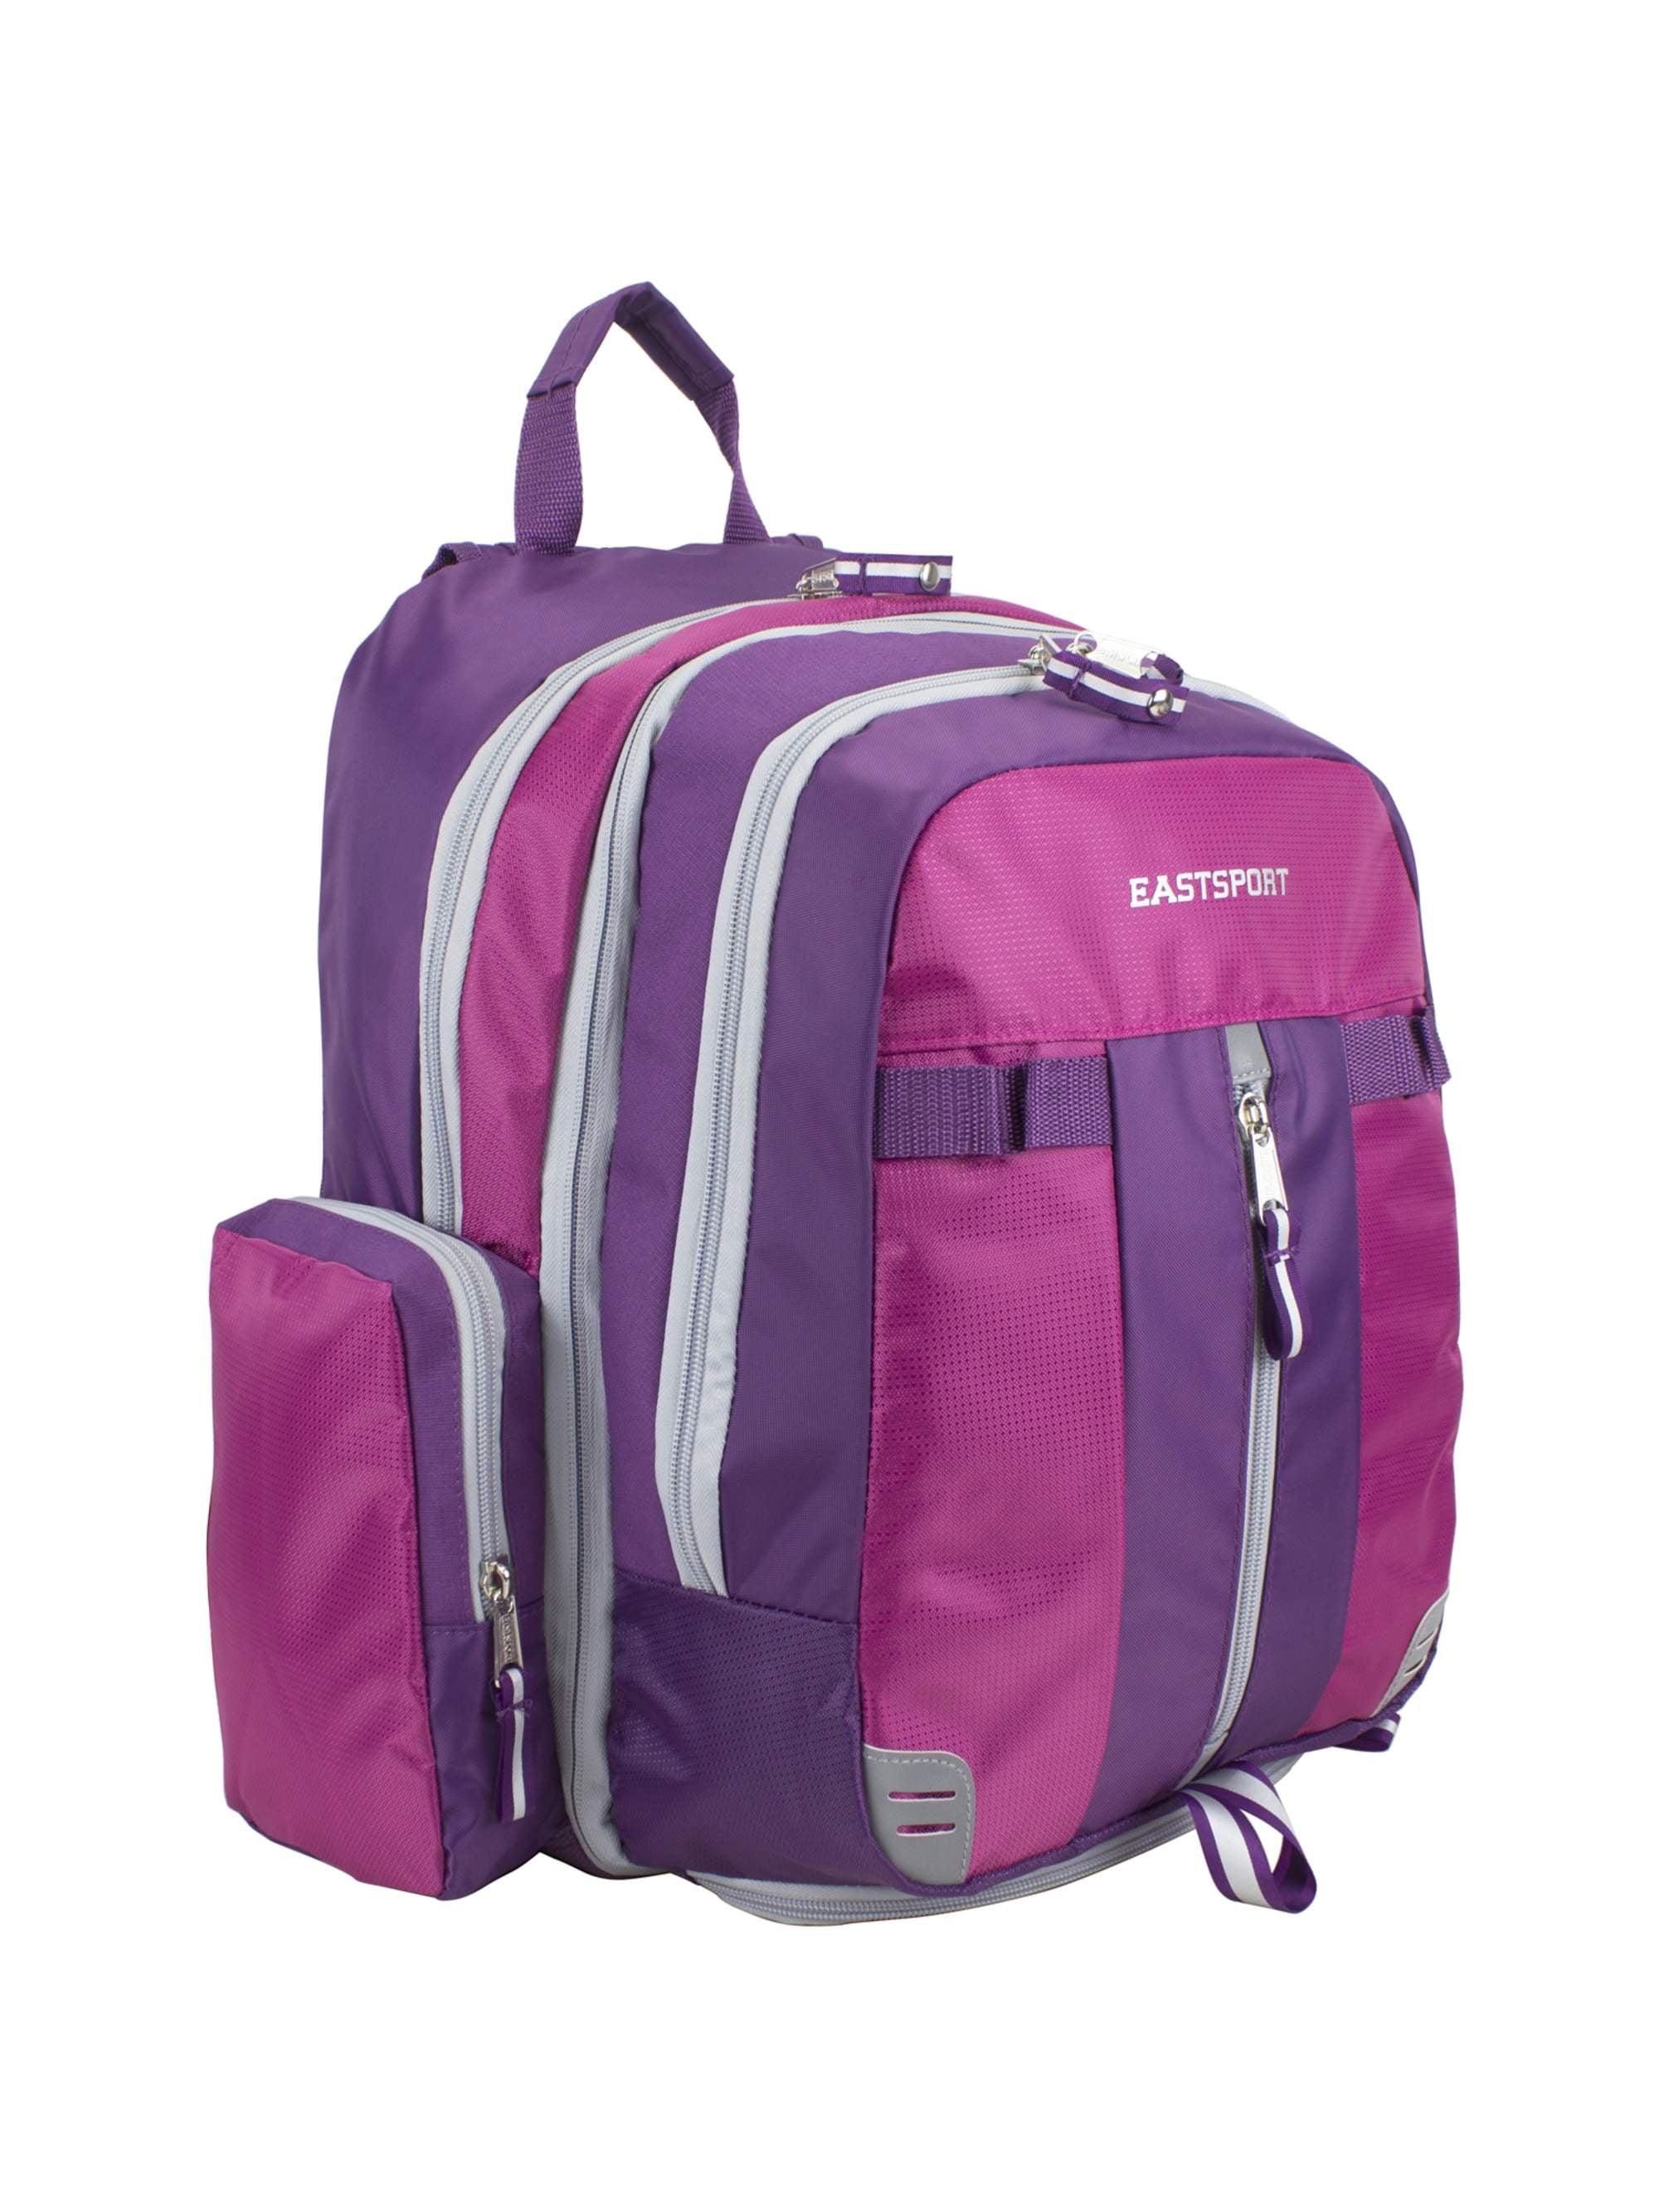 Eastsport - Eastsport Titan Backpack - Walmart.